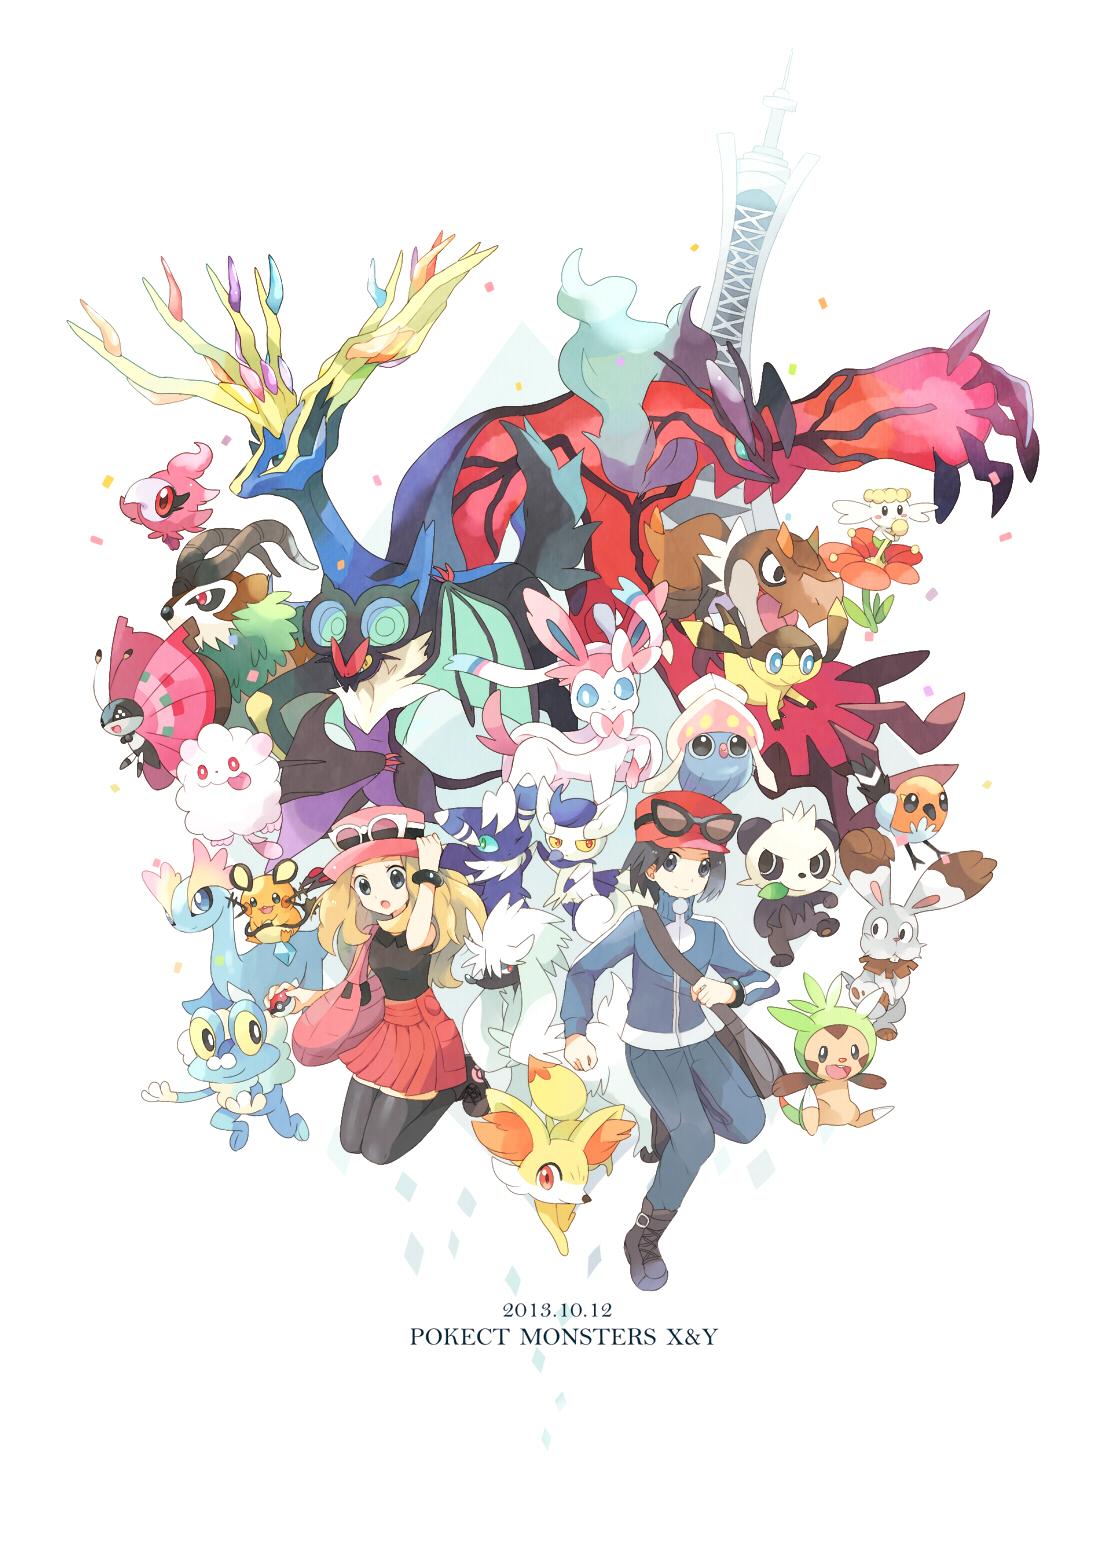 Pokemon X Amp Y Mobile Wallpaper 1609398 Zerochan Anime Image